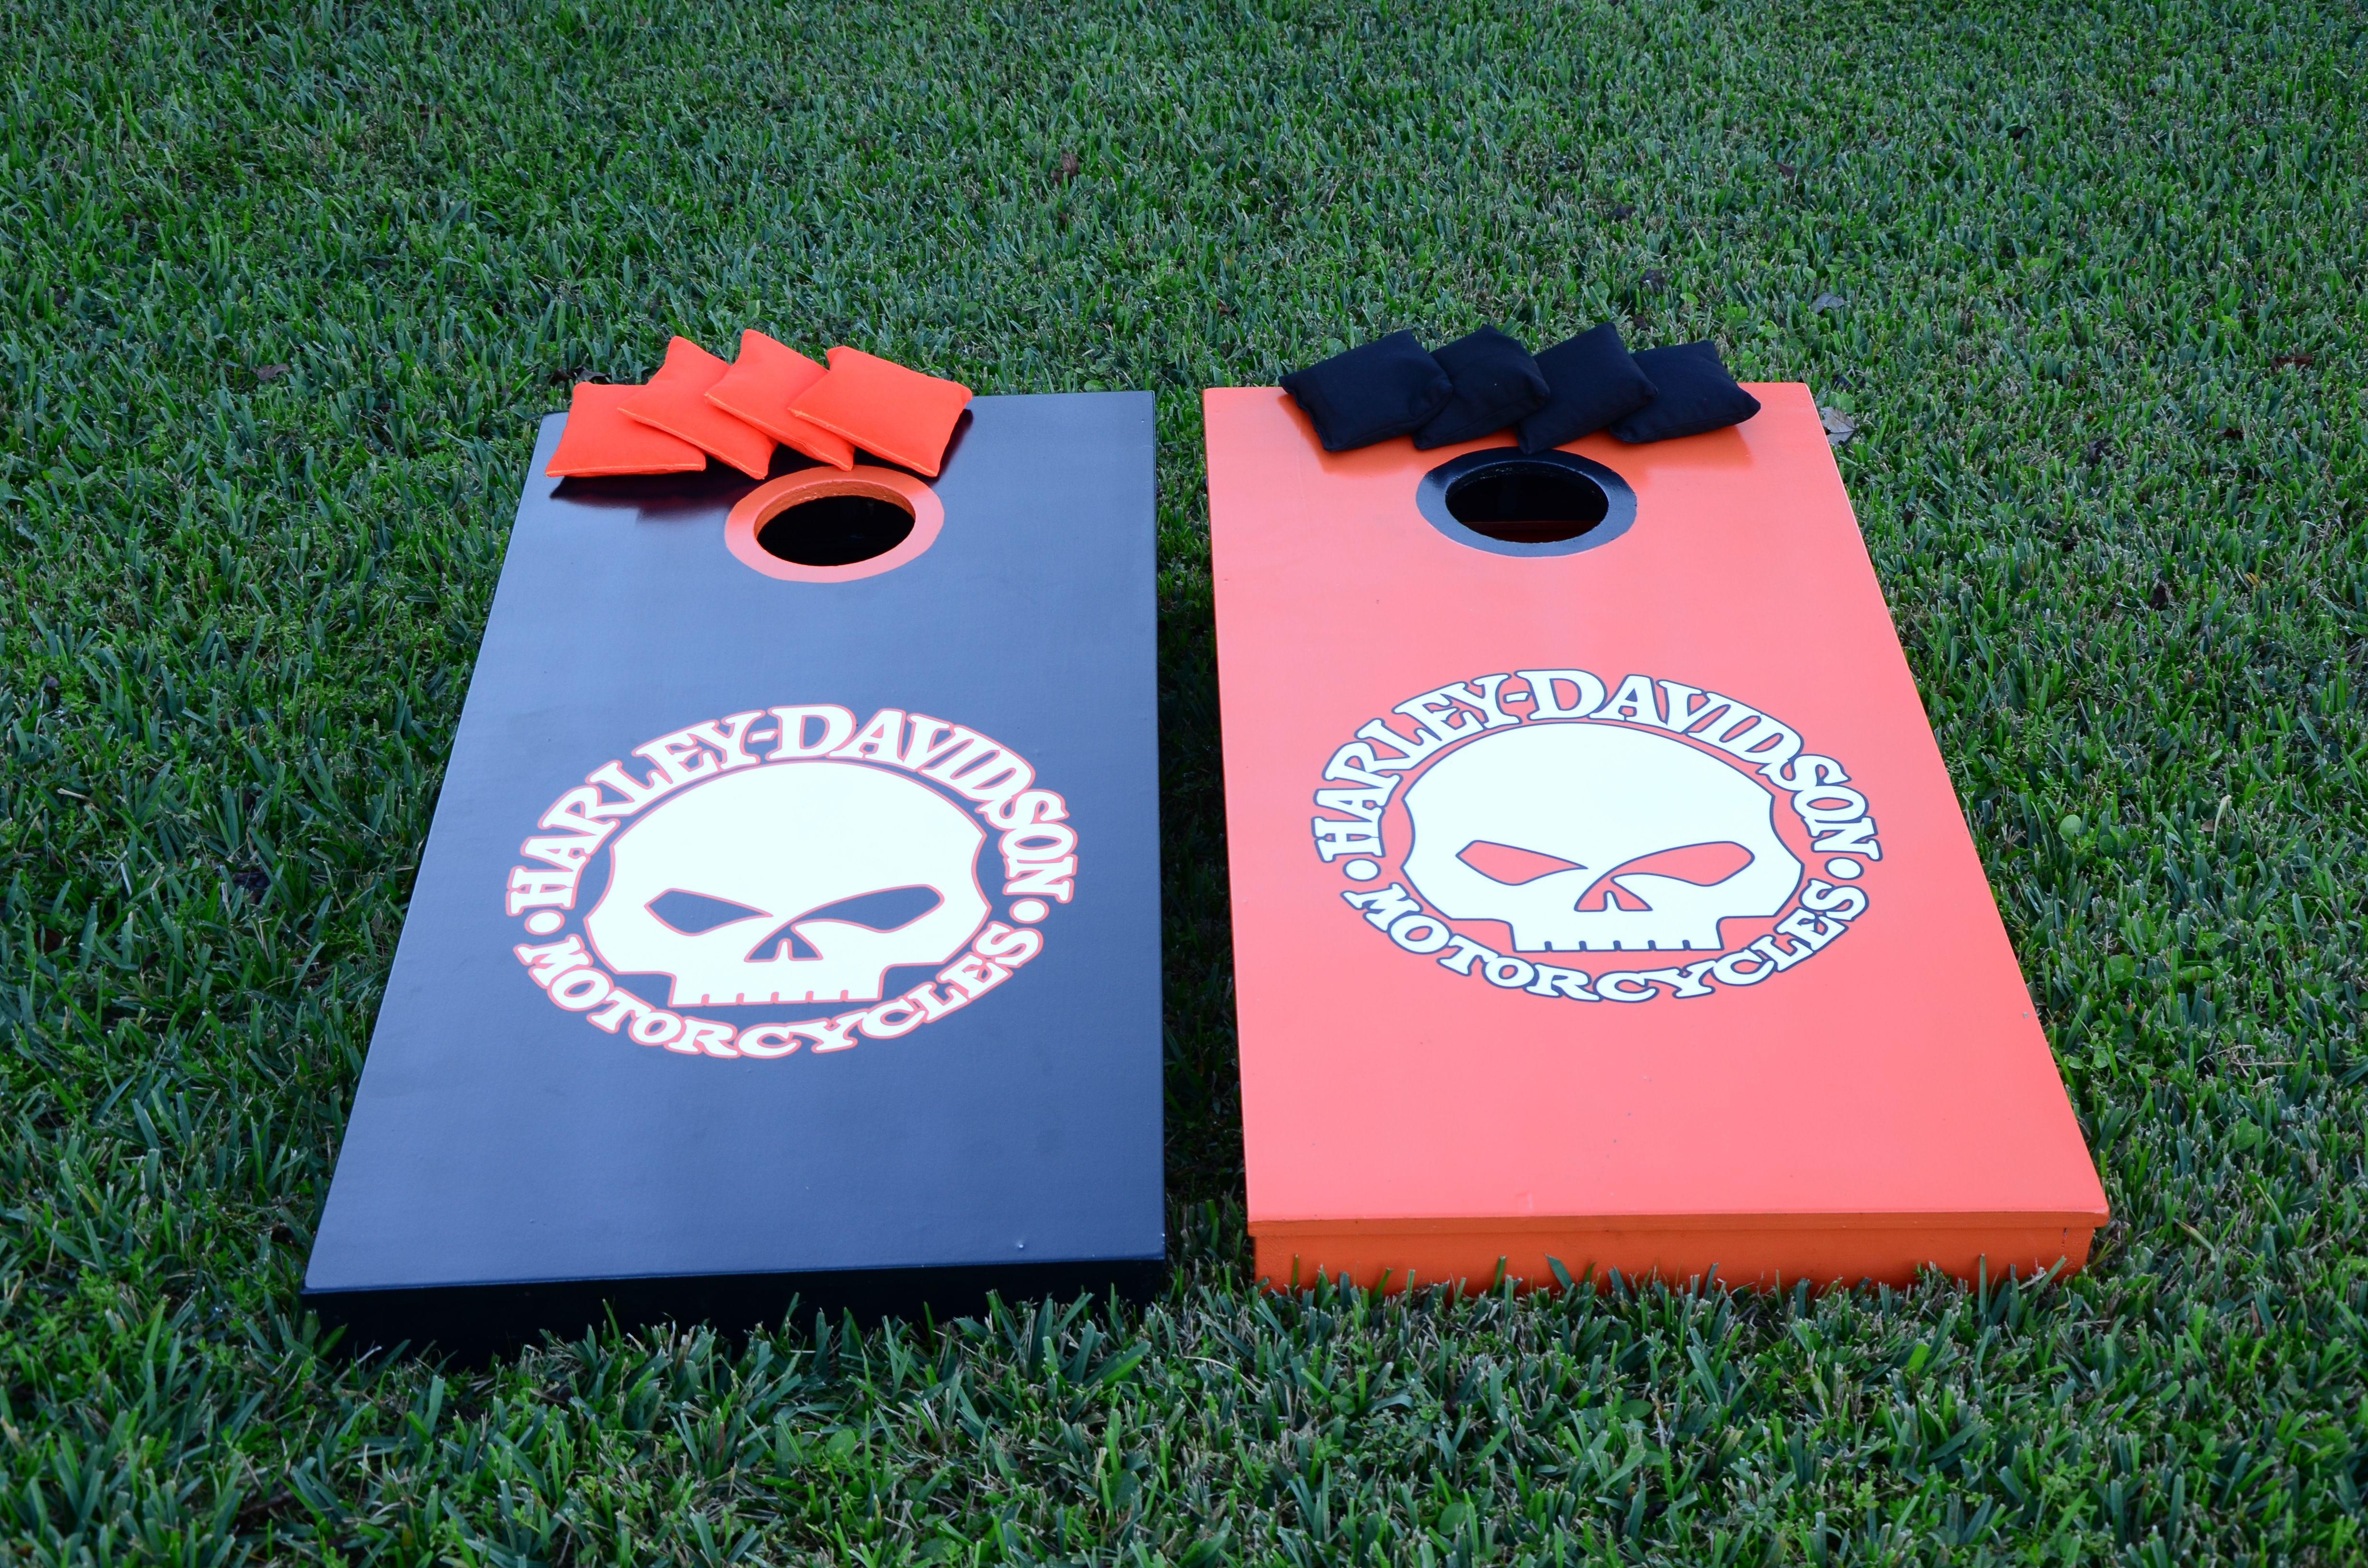 Cornhole Boards Painted Custom Graphics Bean Bag Toss Quality Regulation Size Agreeable To Taste Cornhole Bag Toss Outdoor Sports